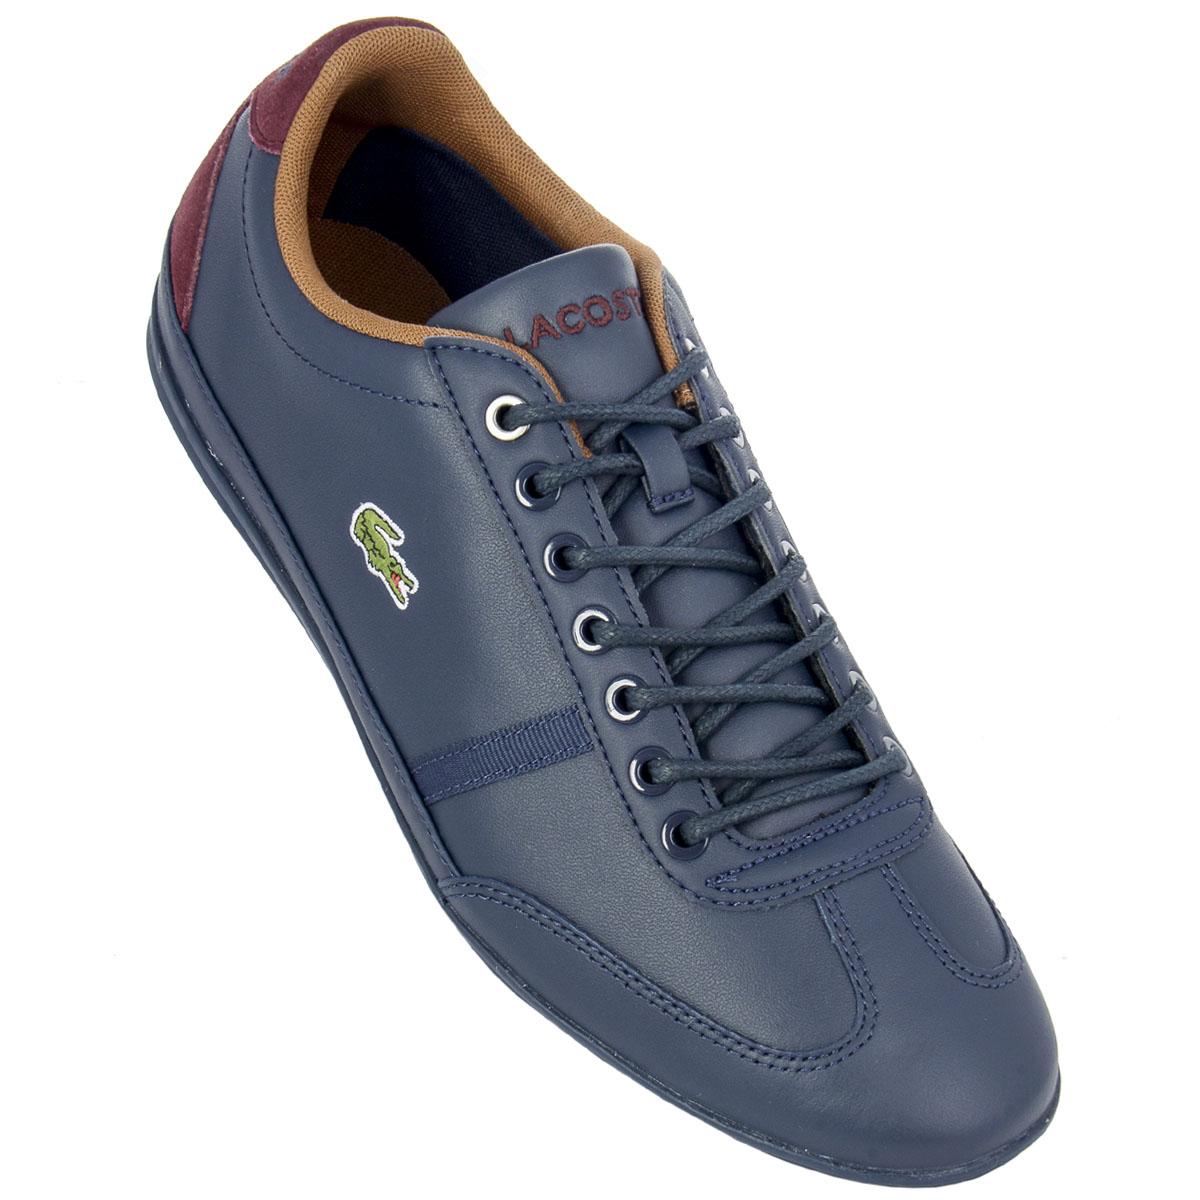 f25e7973e NEW Lacoste Misano Sport 7-34CAM0046003 Men Shoes Trainers Sneakers SALE